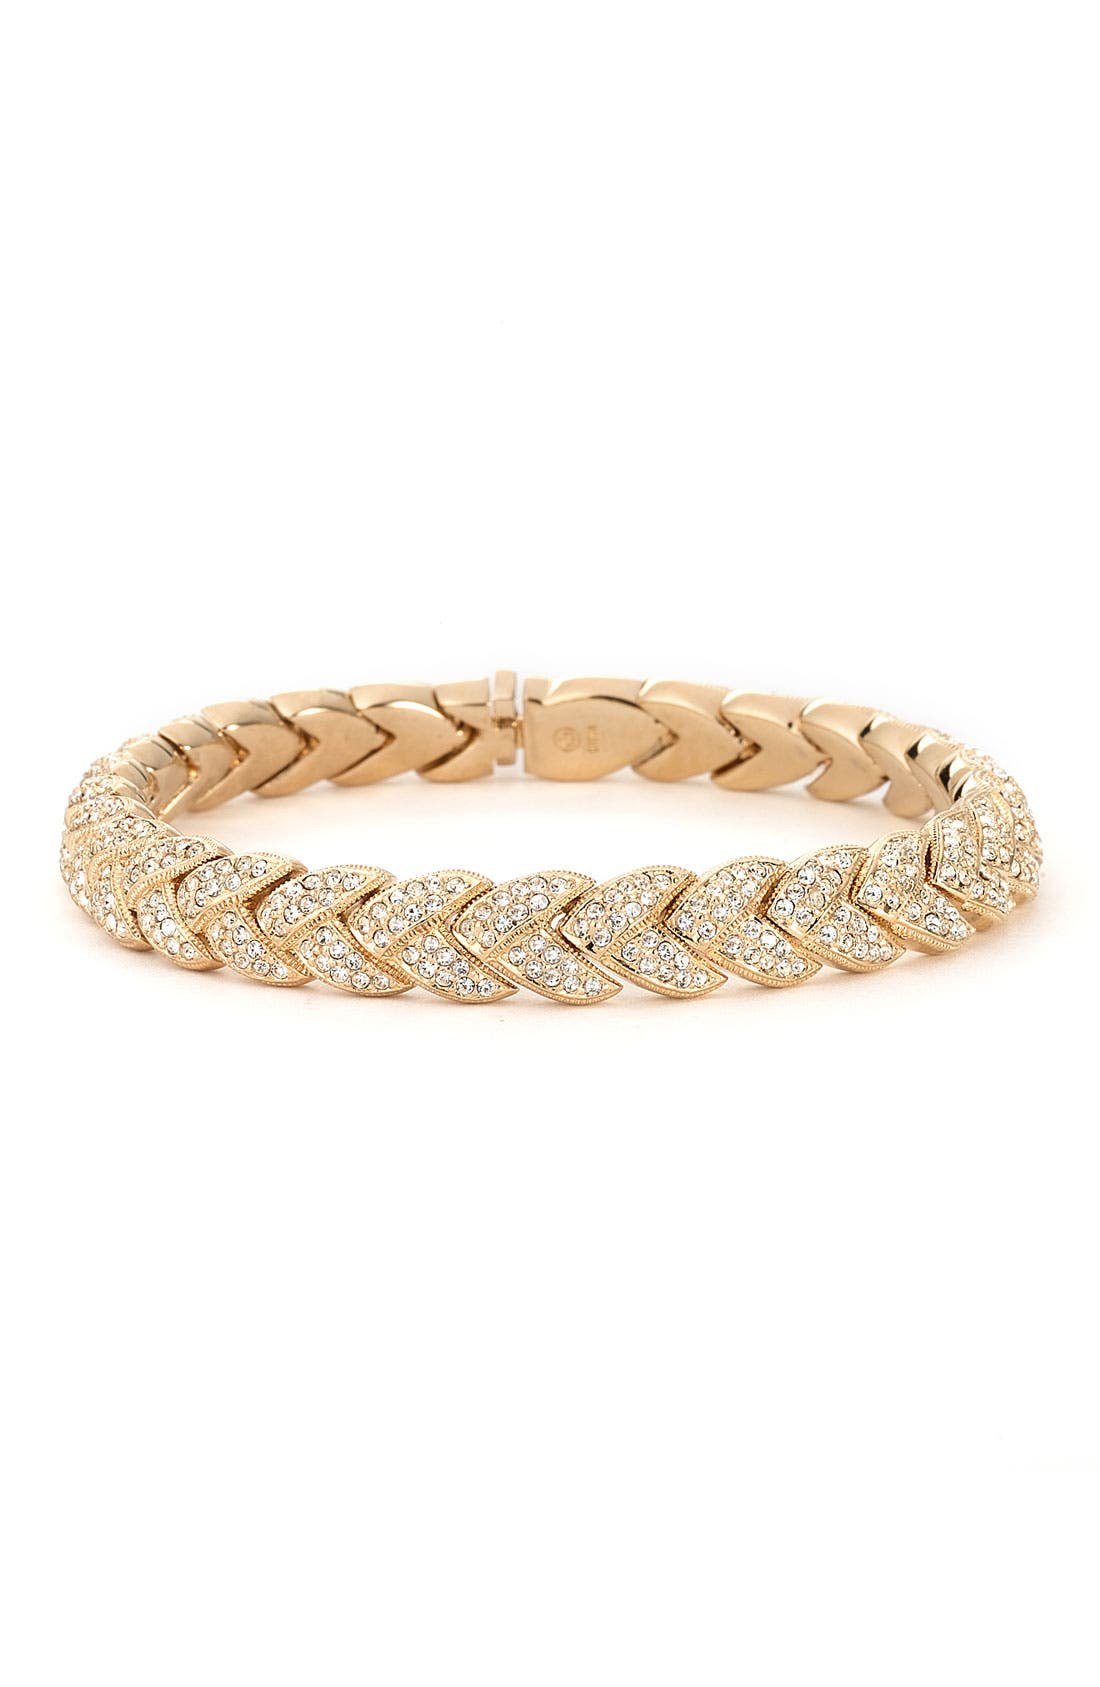 Main Image - Nadri Woven Pavé Crystal Bracelet